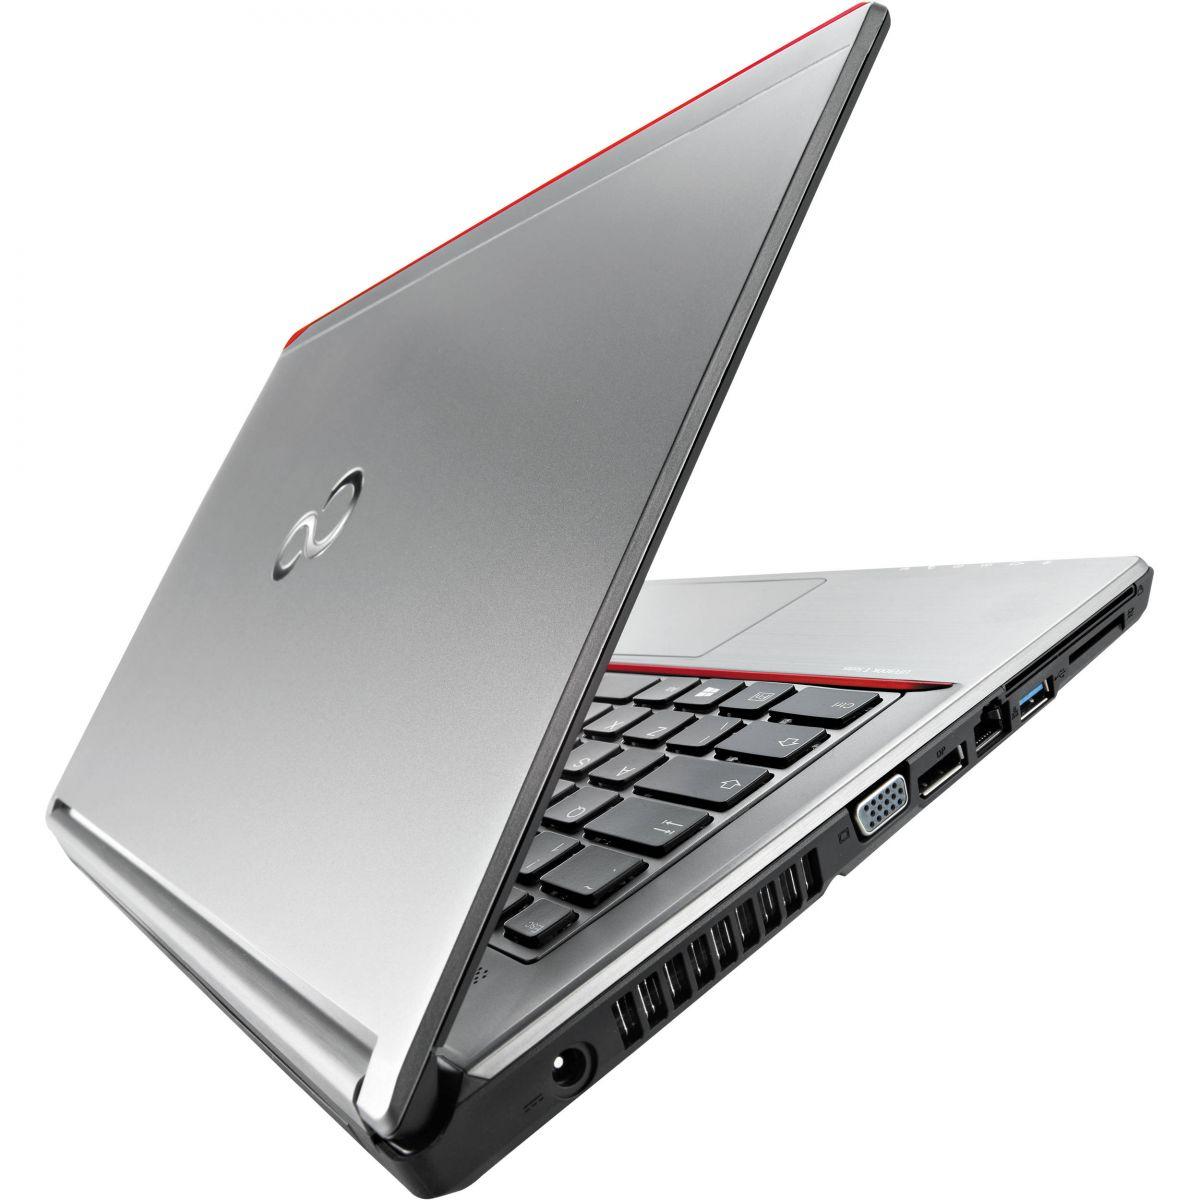 Bộ xử lý Fujitsu Lifebook E734